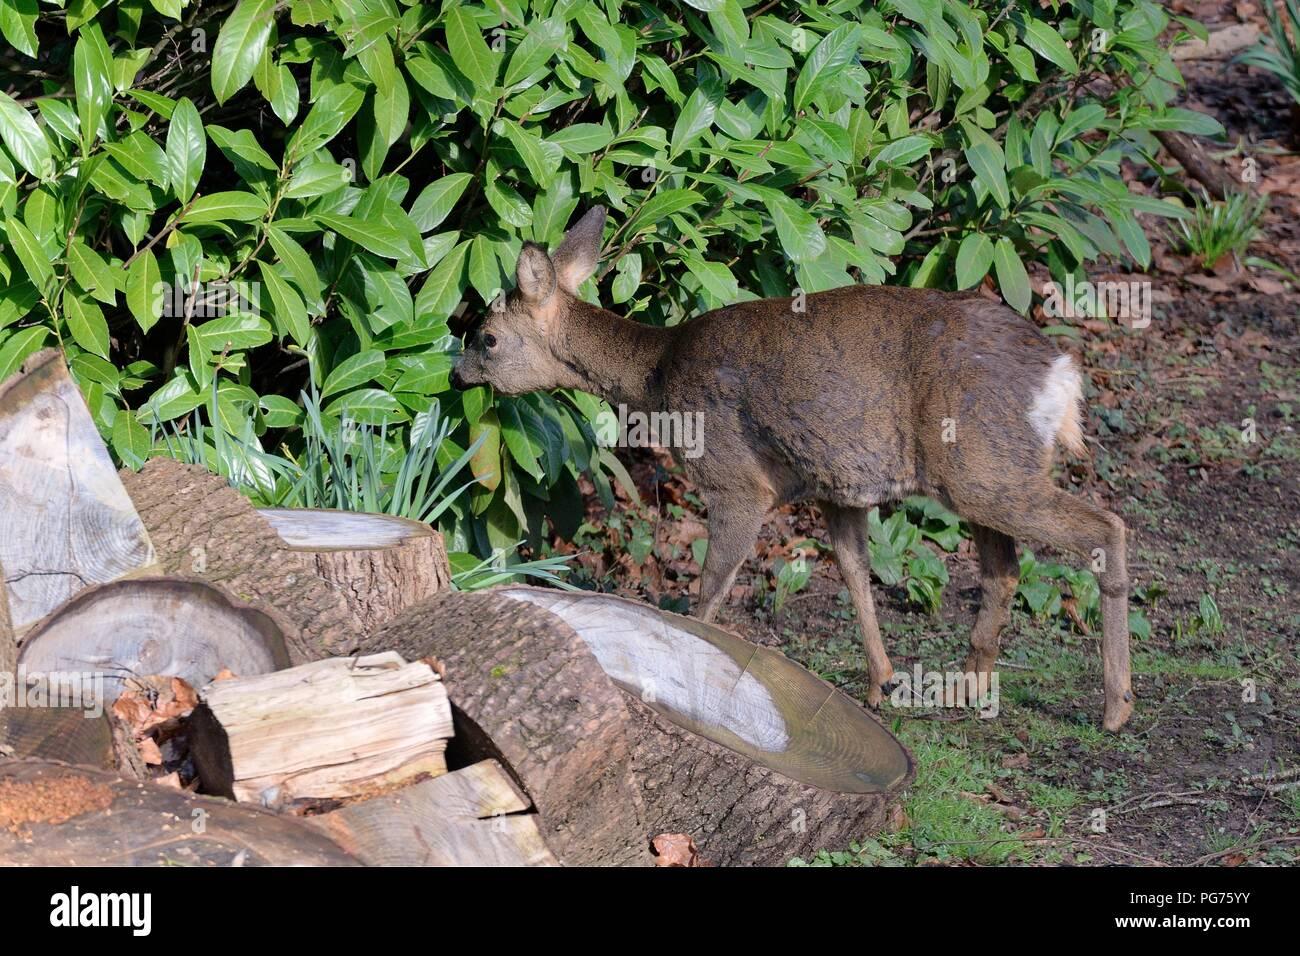 Roe deer doe (Capreolus capreolus) grazing a Cherry laurel bush (Prunus laurocerasus) in a garden, Wiltshire, March. - Stock Image